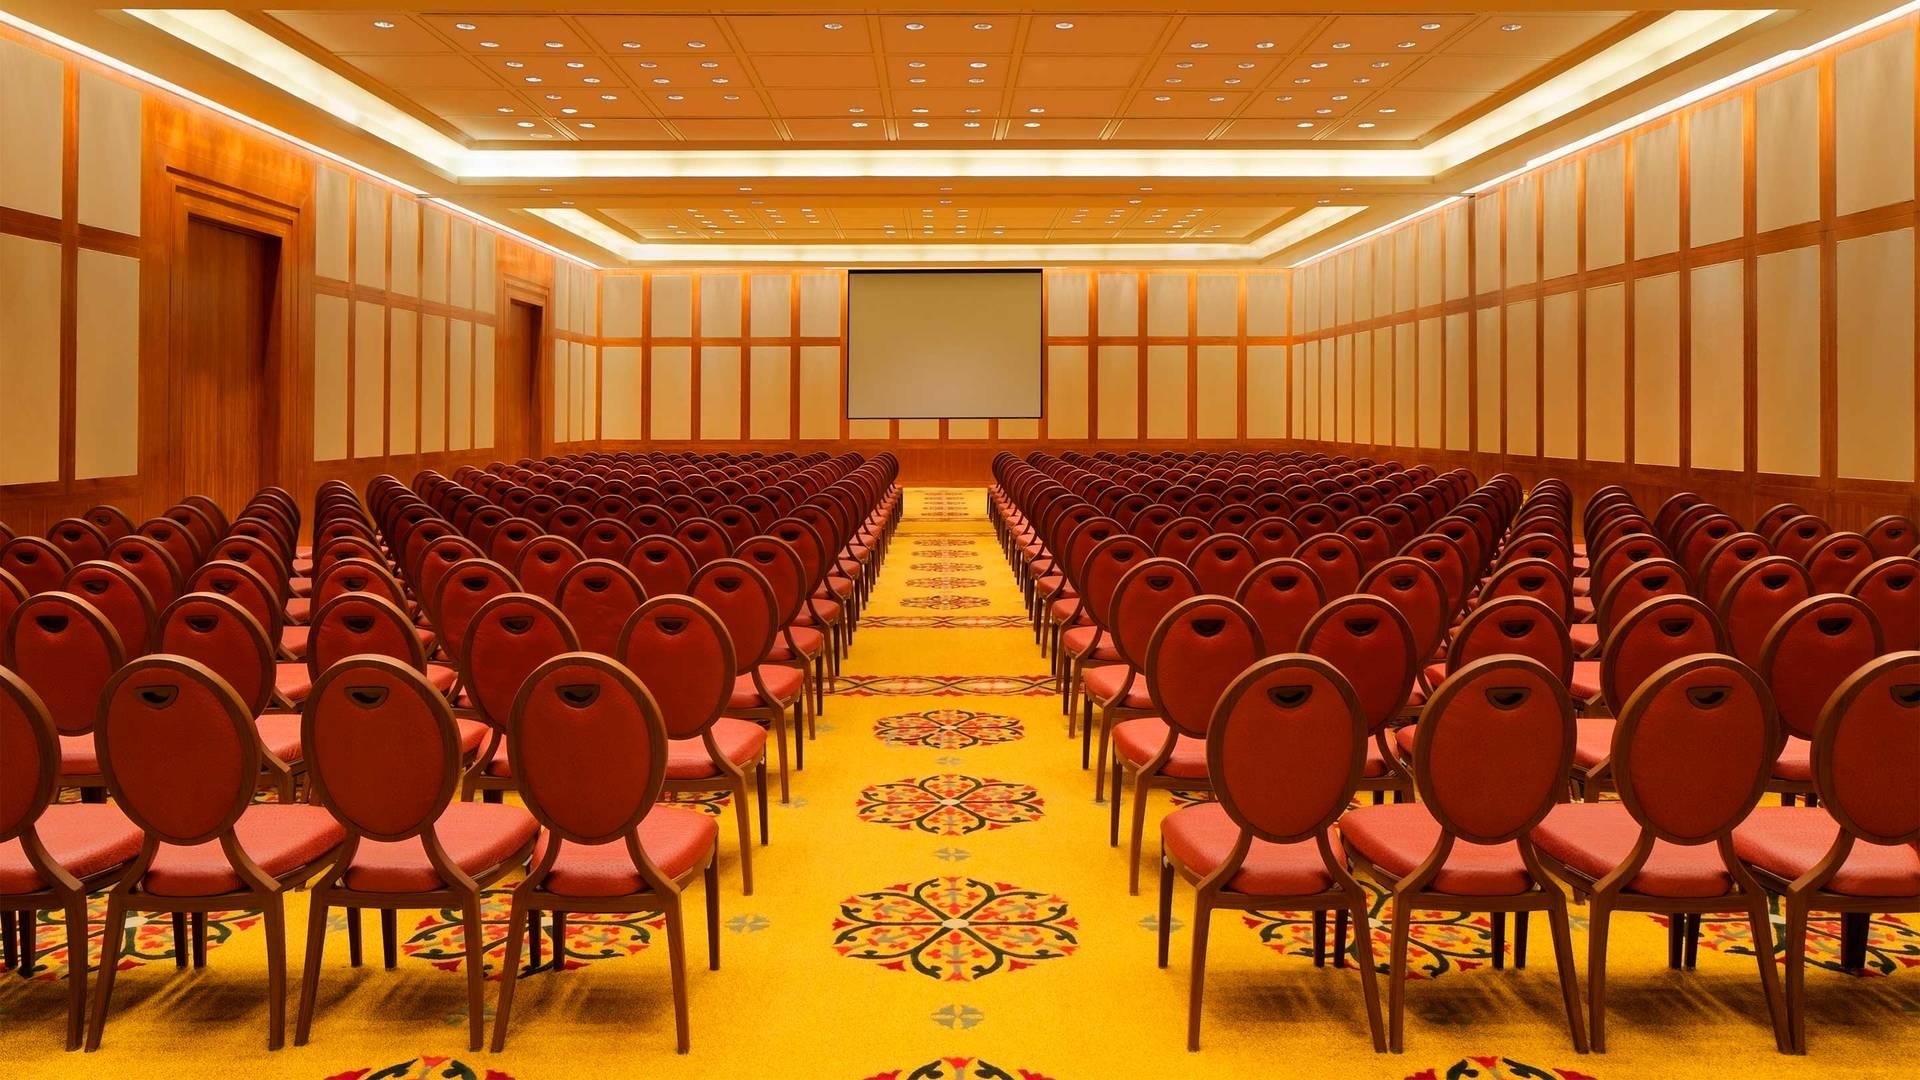 https://cdn.jumeirah.com/-/mediadh/DH/Hospitality/Jumeirah/Hotels/Kuwait/Jumeirah-Messilah-Beach-Hotel-and-Spa/Meeting-Rooms/Messilah-Ballroom/169JumeirahMessilahinterior-whole-BeachHotelSpaMessilah_landscape.jpg?h=1080&w=1920&hash=6C99167AEC279FC8E730B9B2E1C69F71